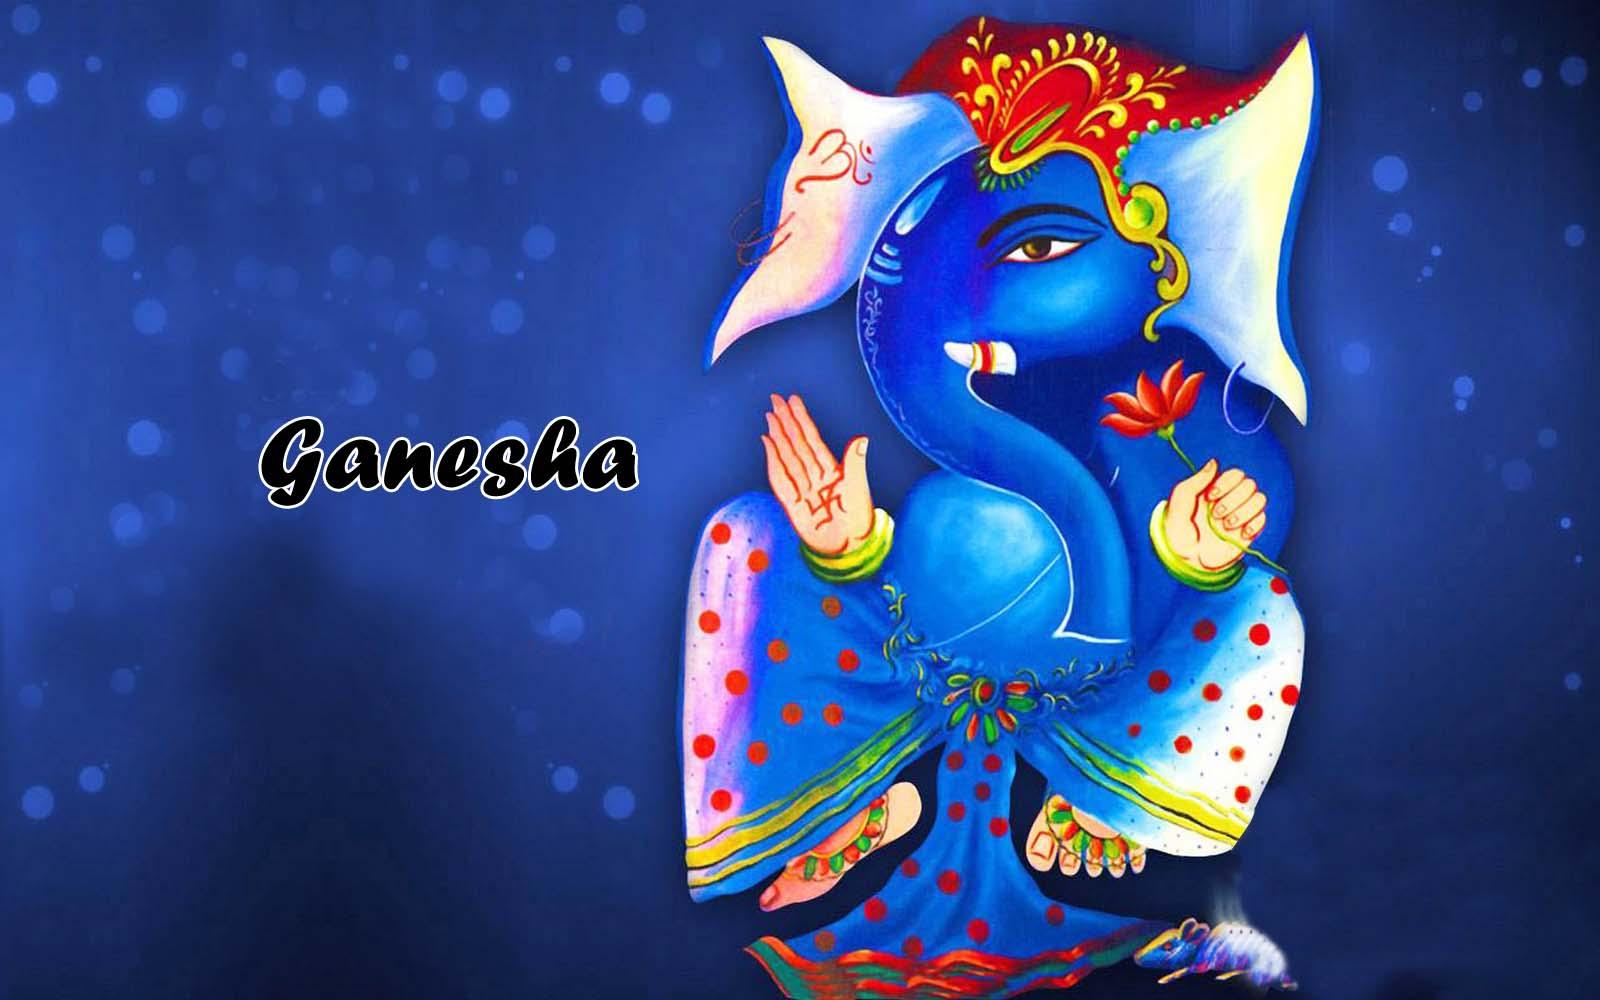 Ganesha Hd New Wallpapers Free Download - Xxx Sex Fuck -9922